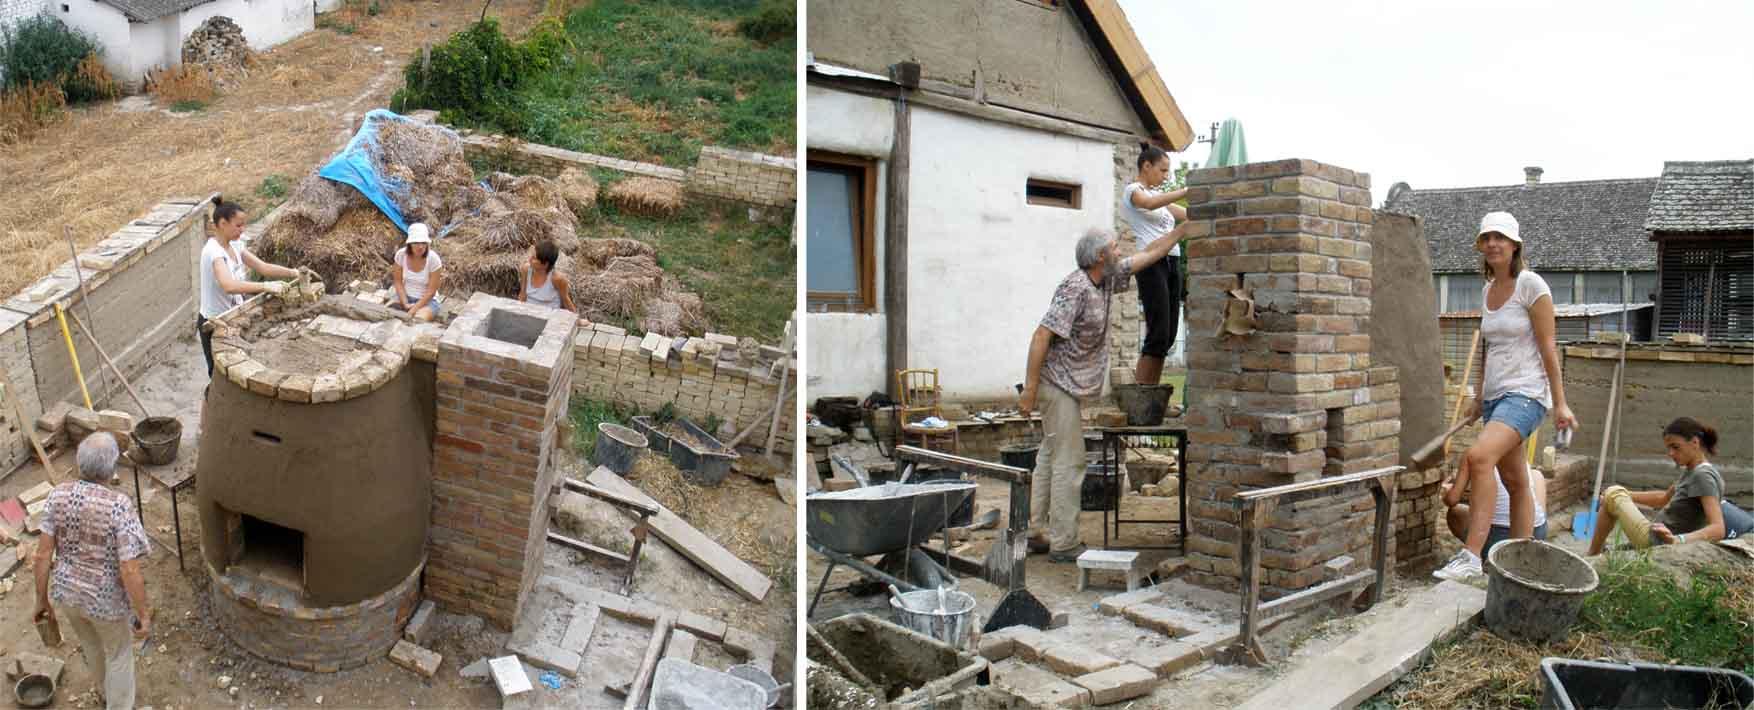 48 pećke Vass Zoltan žemska pećka radionica zidanje